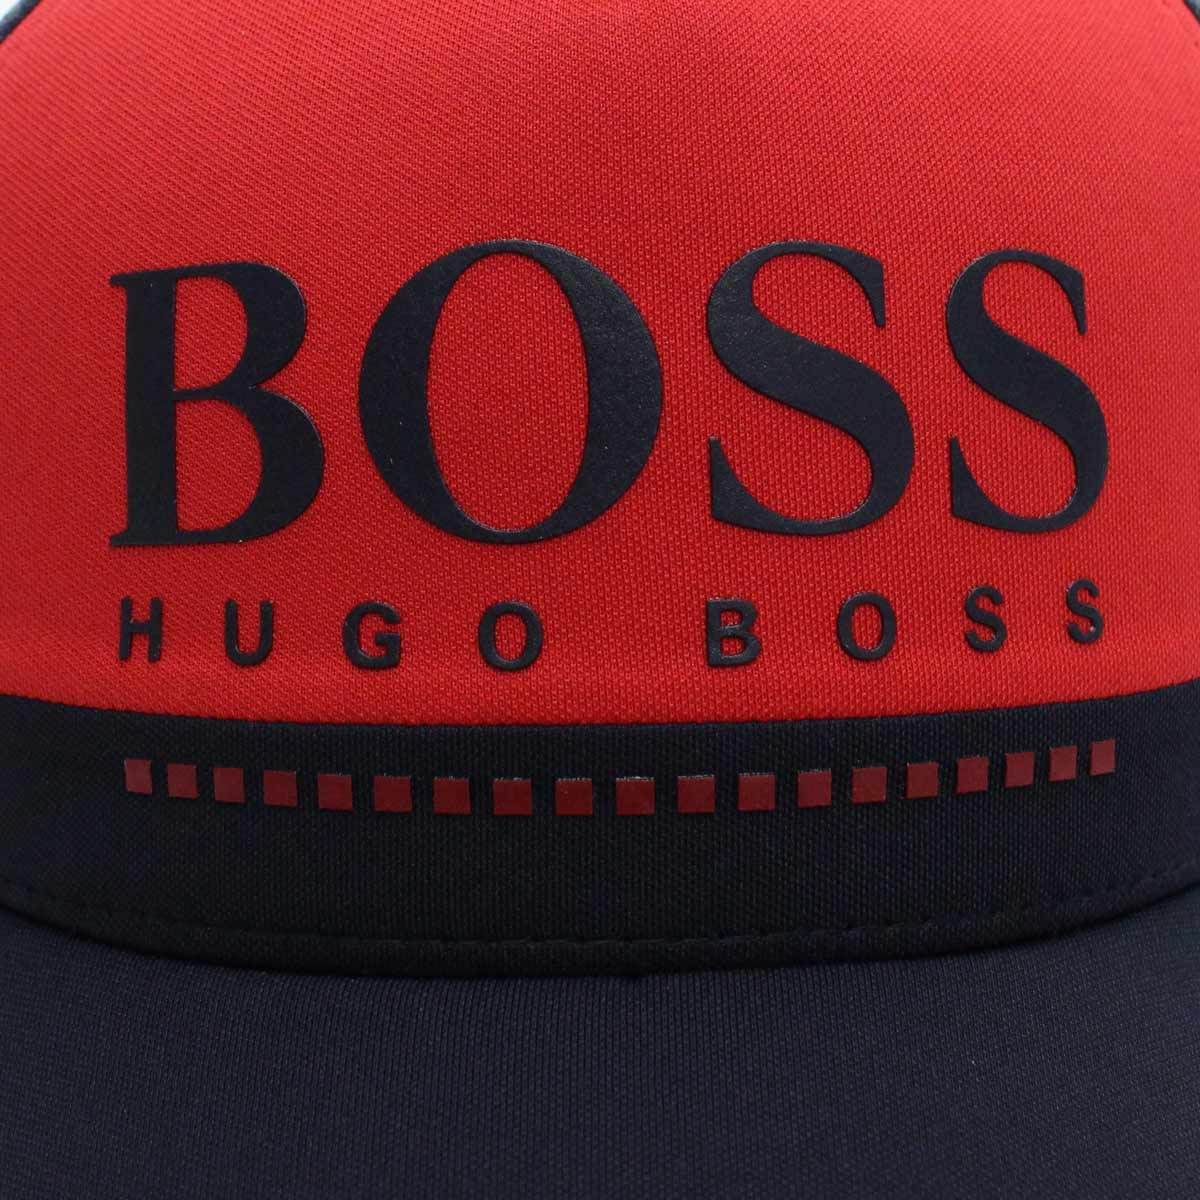 Schnelle Lieferung später größte Auswahl Red system men of Hugo Boss HUGO BOSS LOGO-CAP-3 by color cap 50402452  10214485 622 navy origin